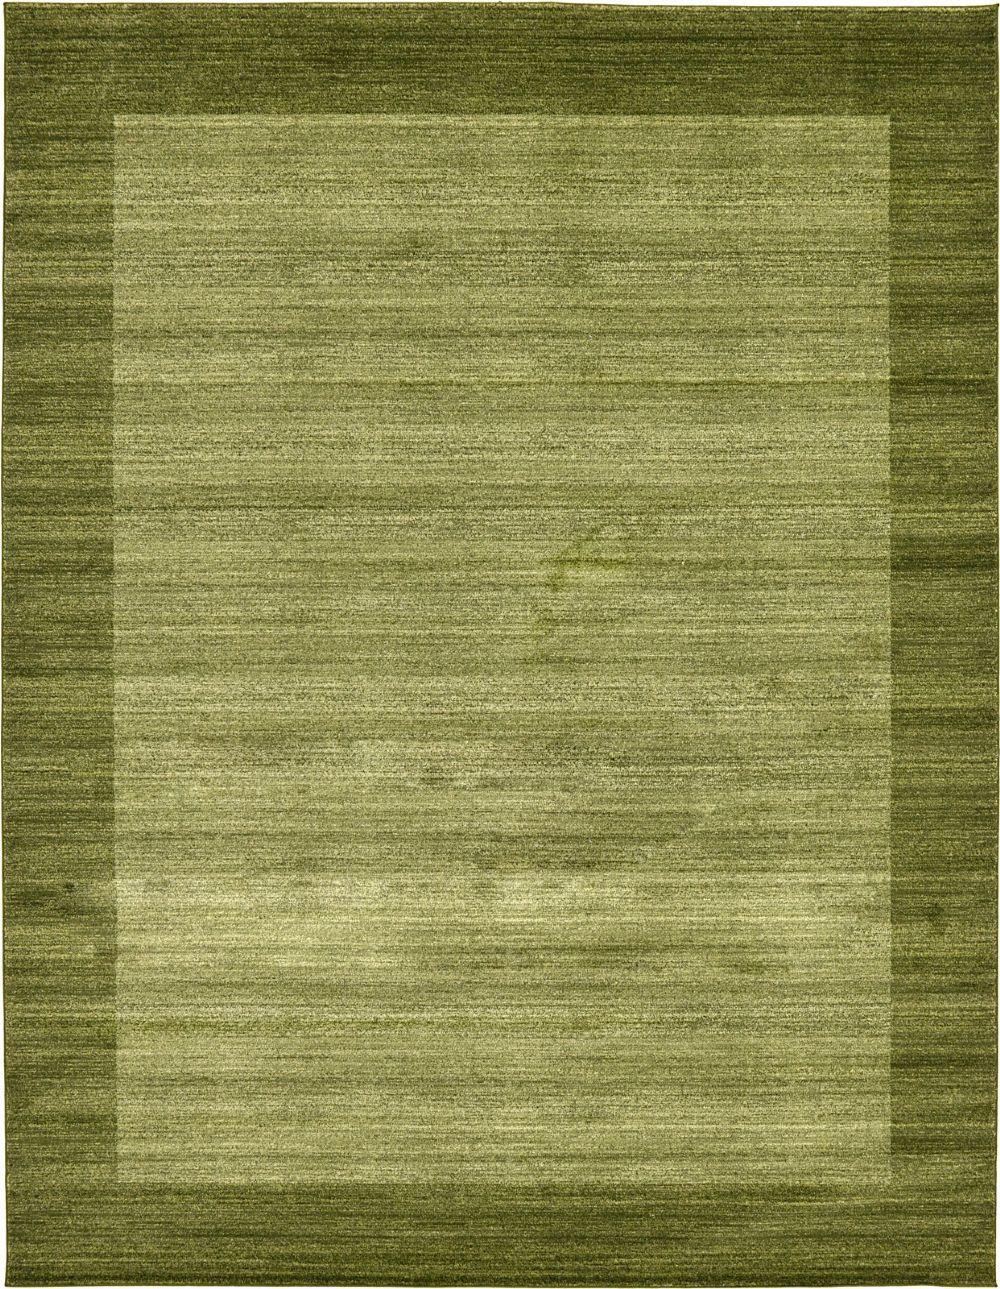 rugpal desdemona contemporary area rug collection